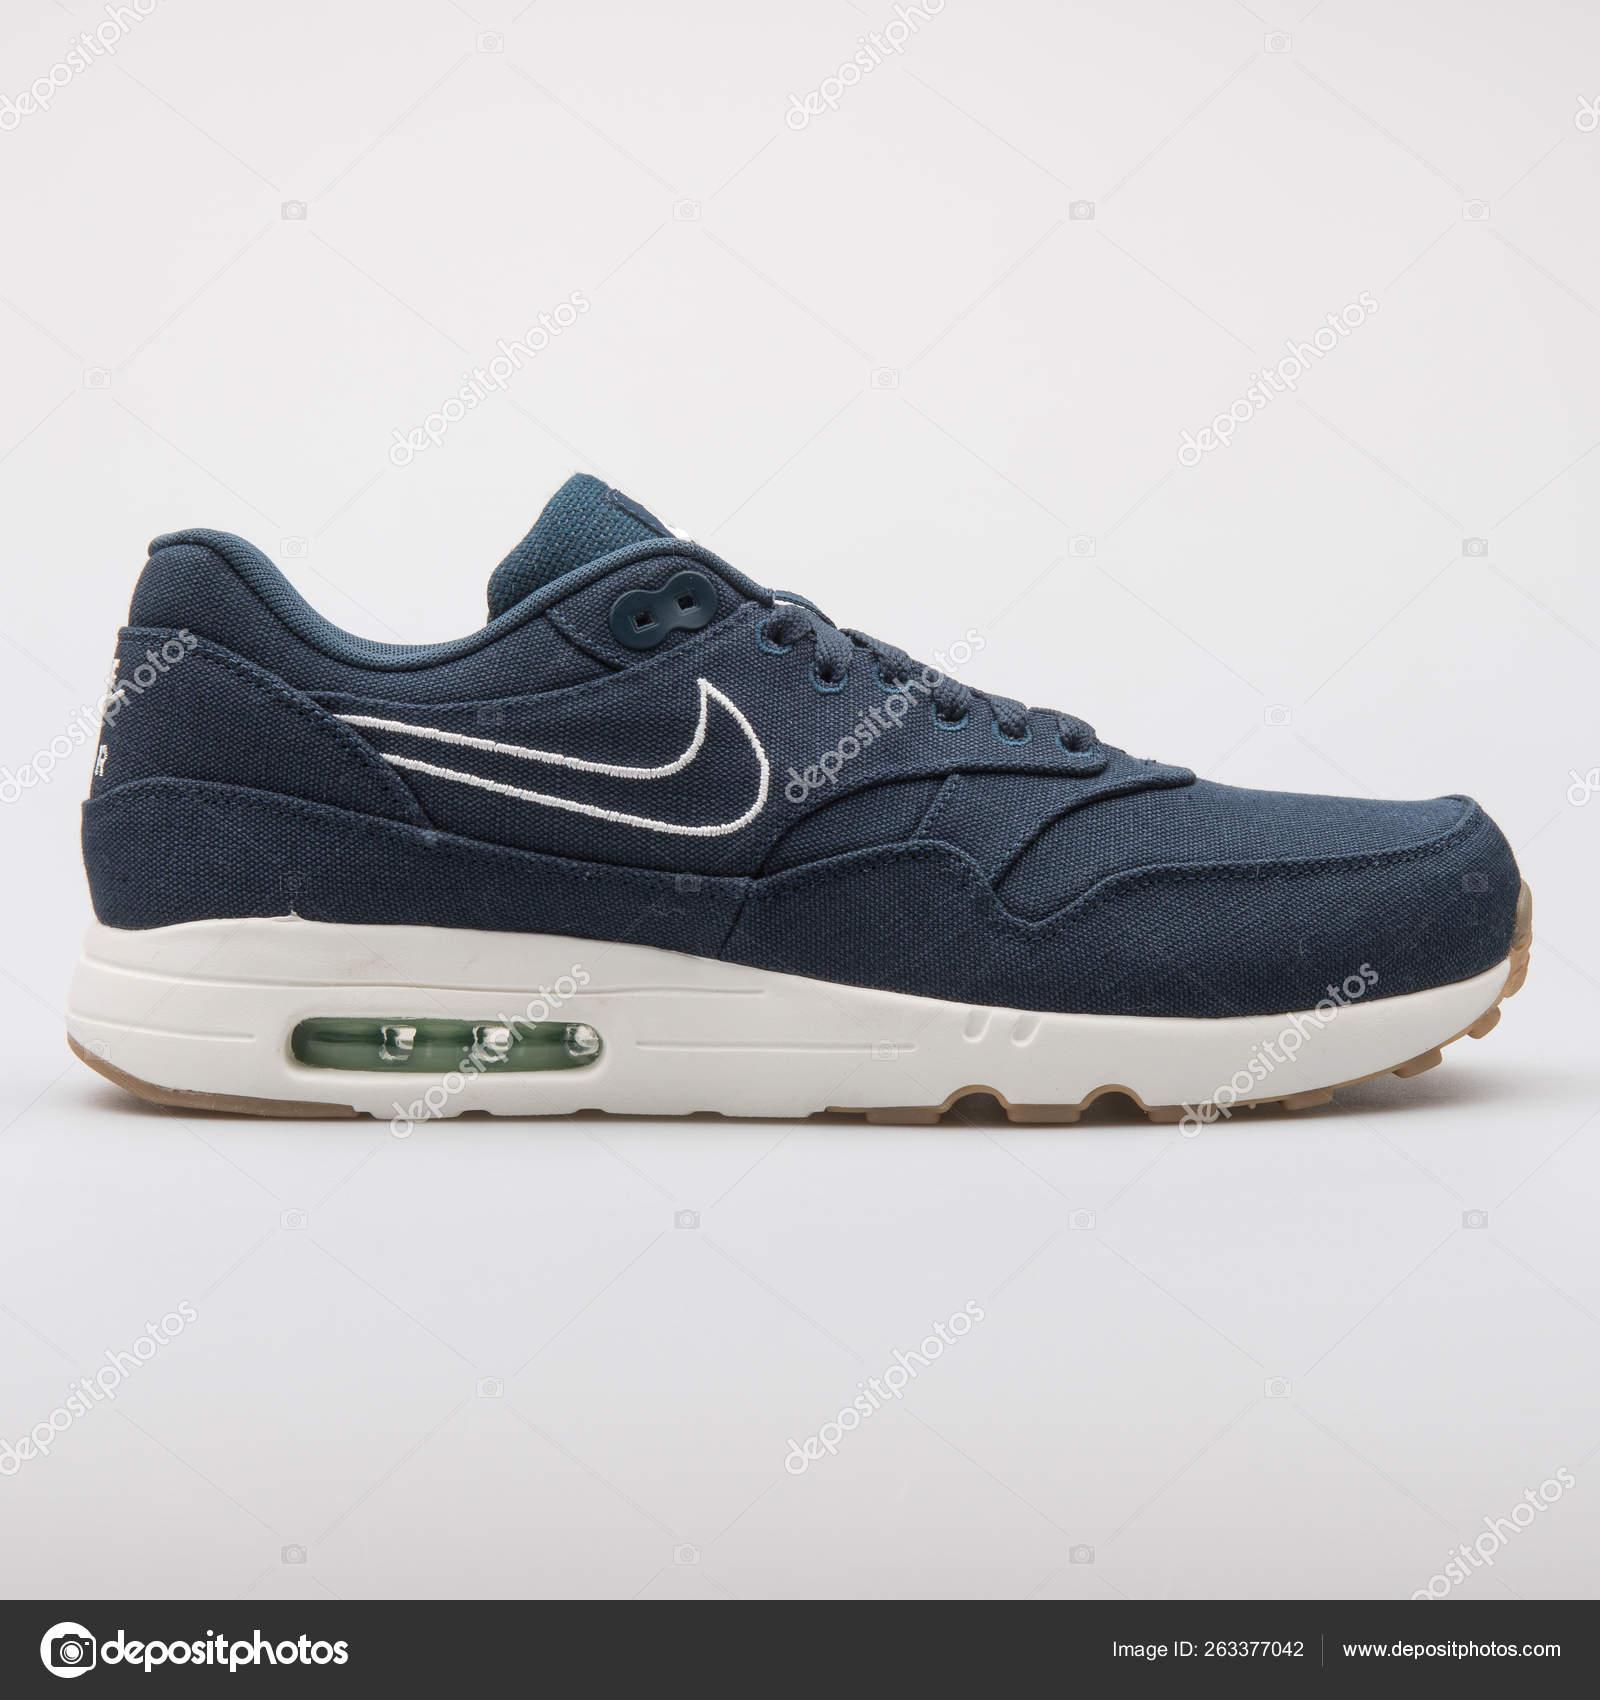 3e500b92 Nike Air Max 1 Ultra 2.0 TXT navy blue sneaker – Stock Editorial ...